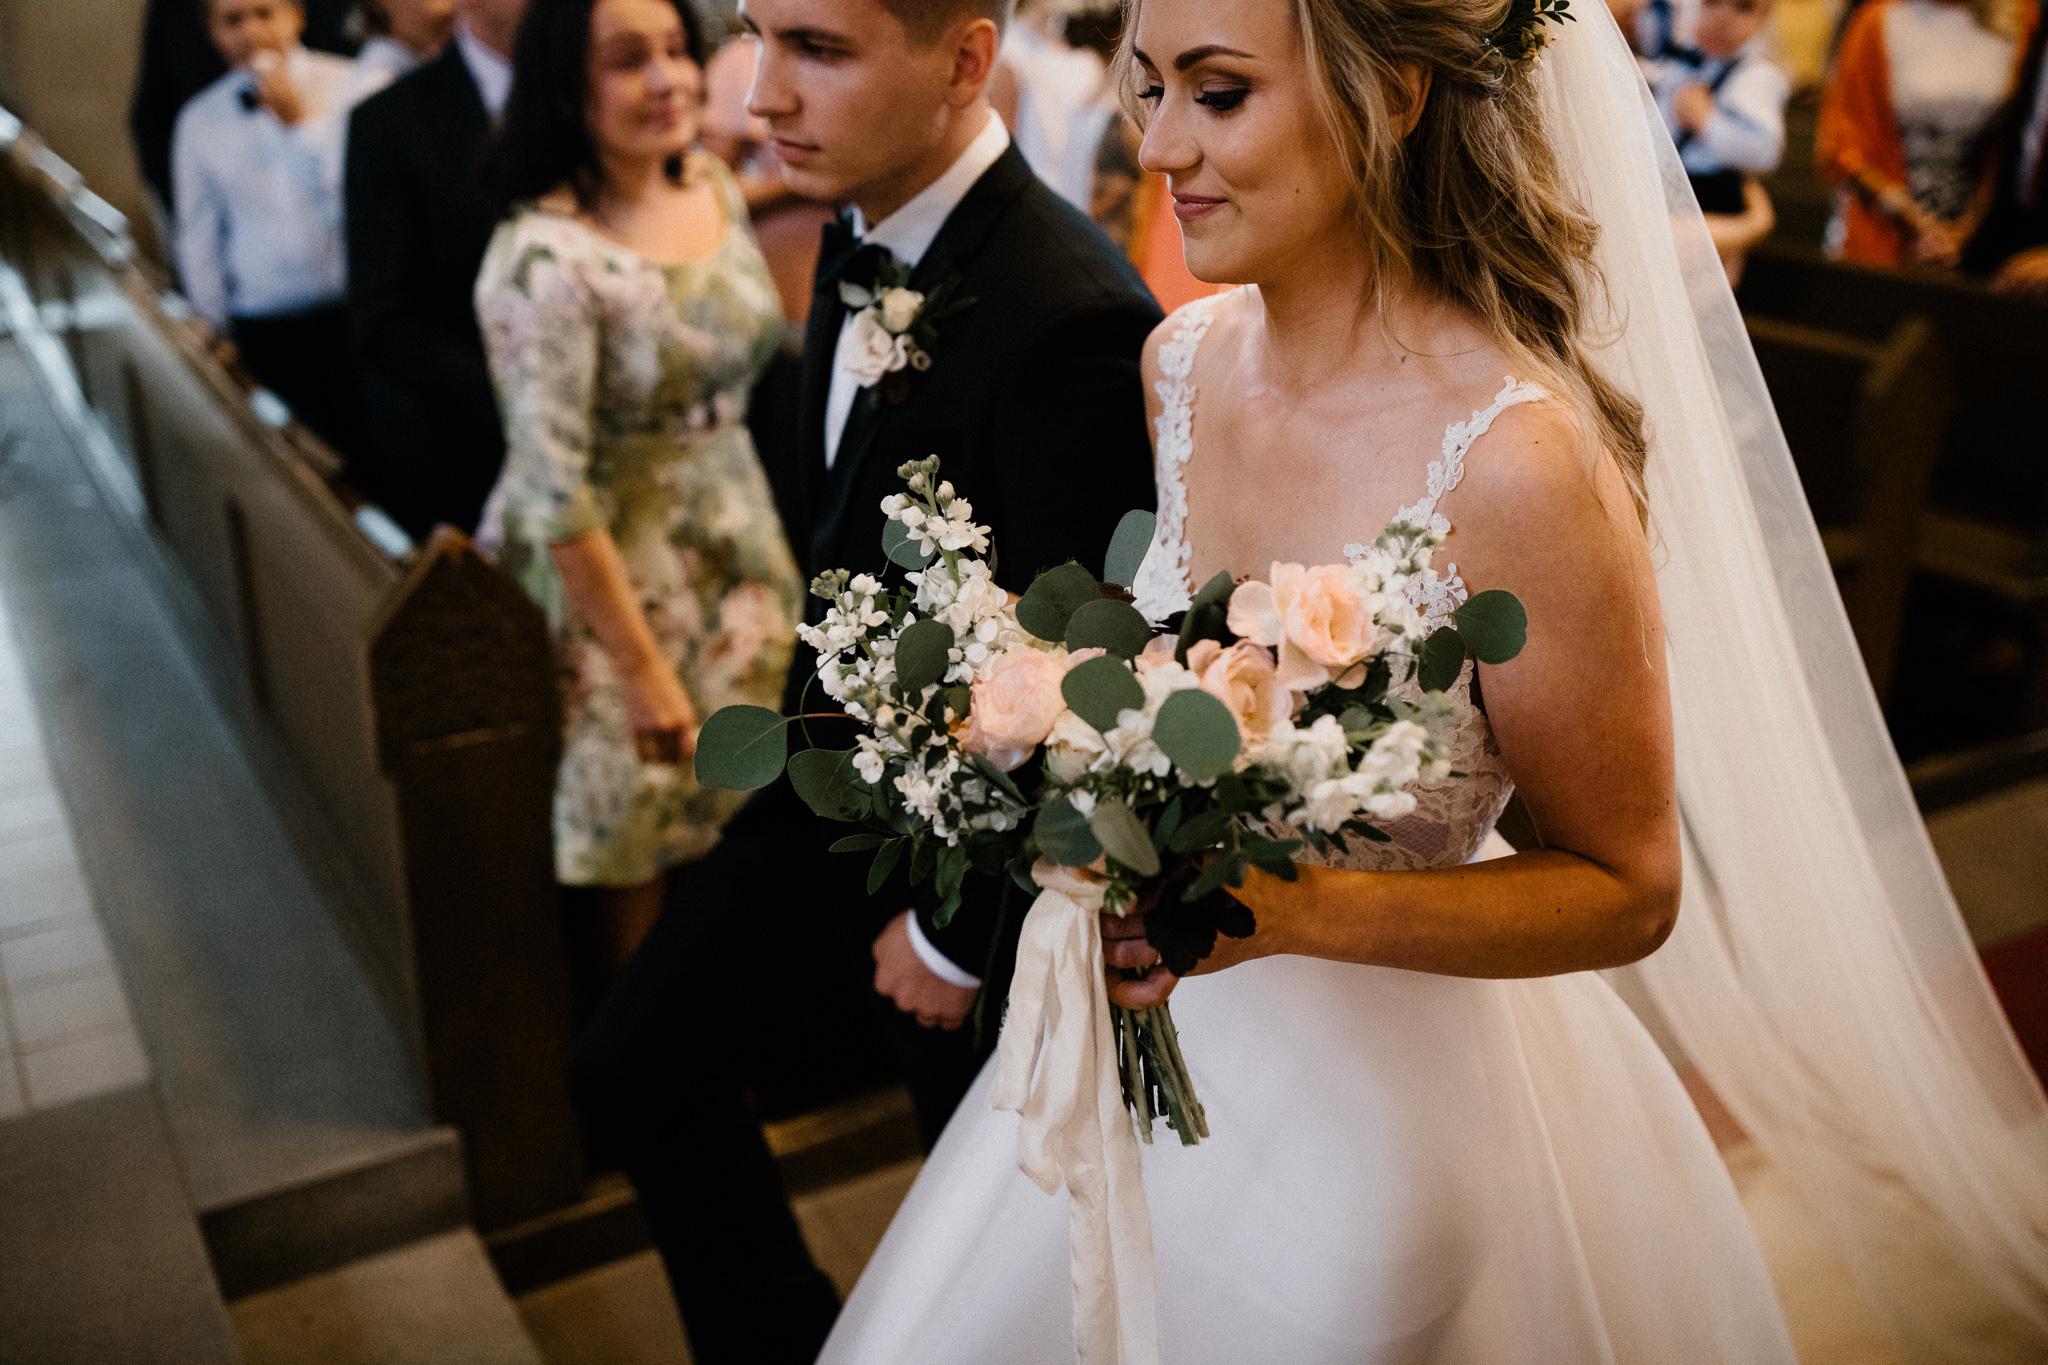 Johanna + Mikko - Tampere - Photo by Patrick Karkkolainen Wedding Photographer-63.jpg